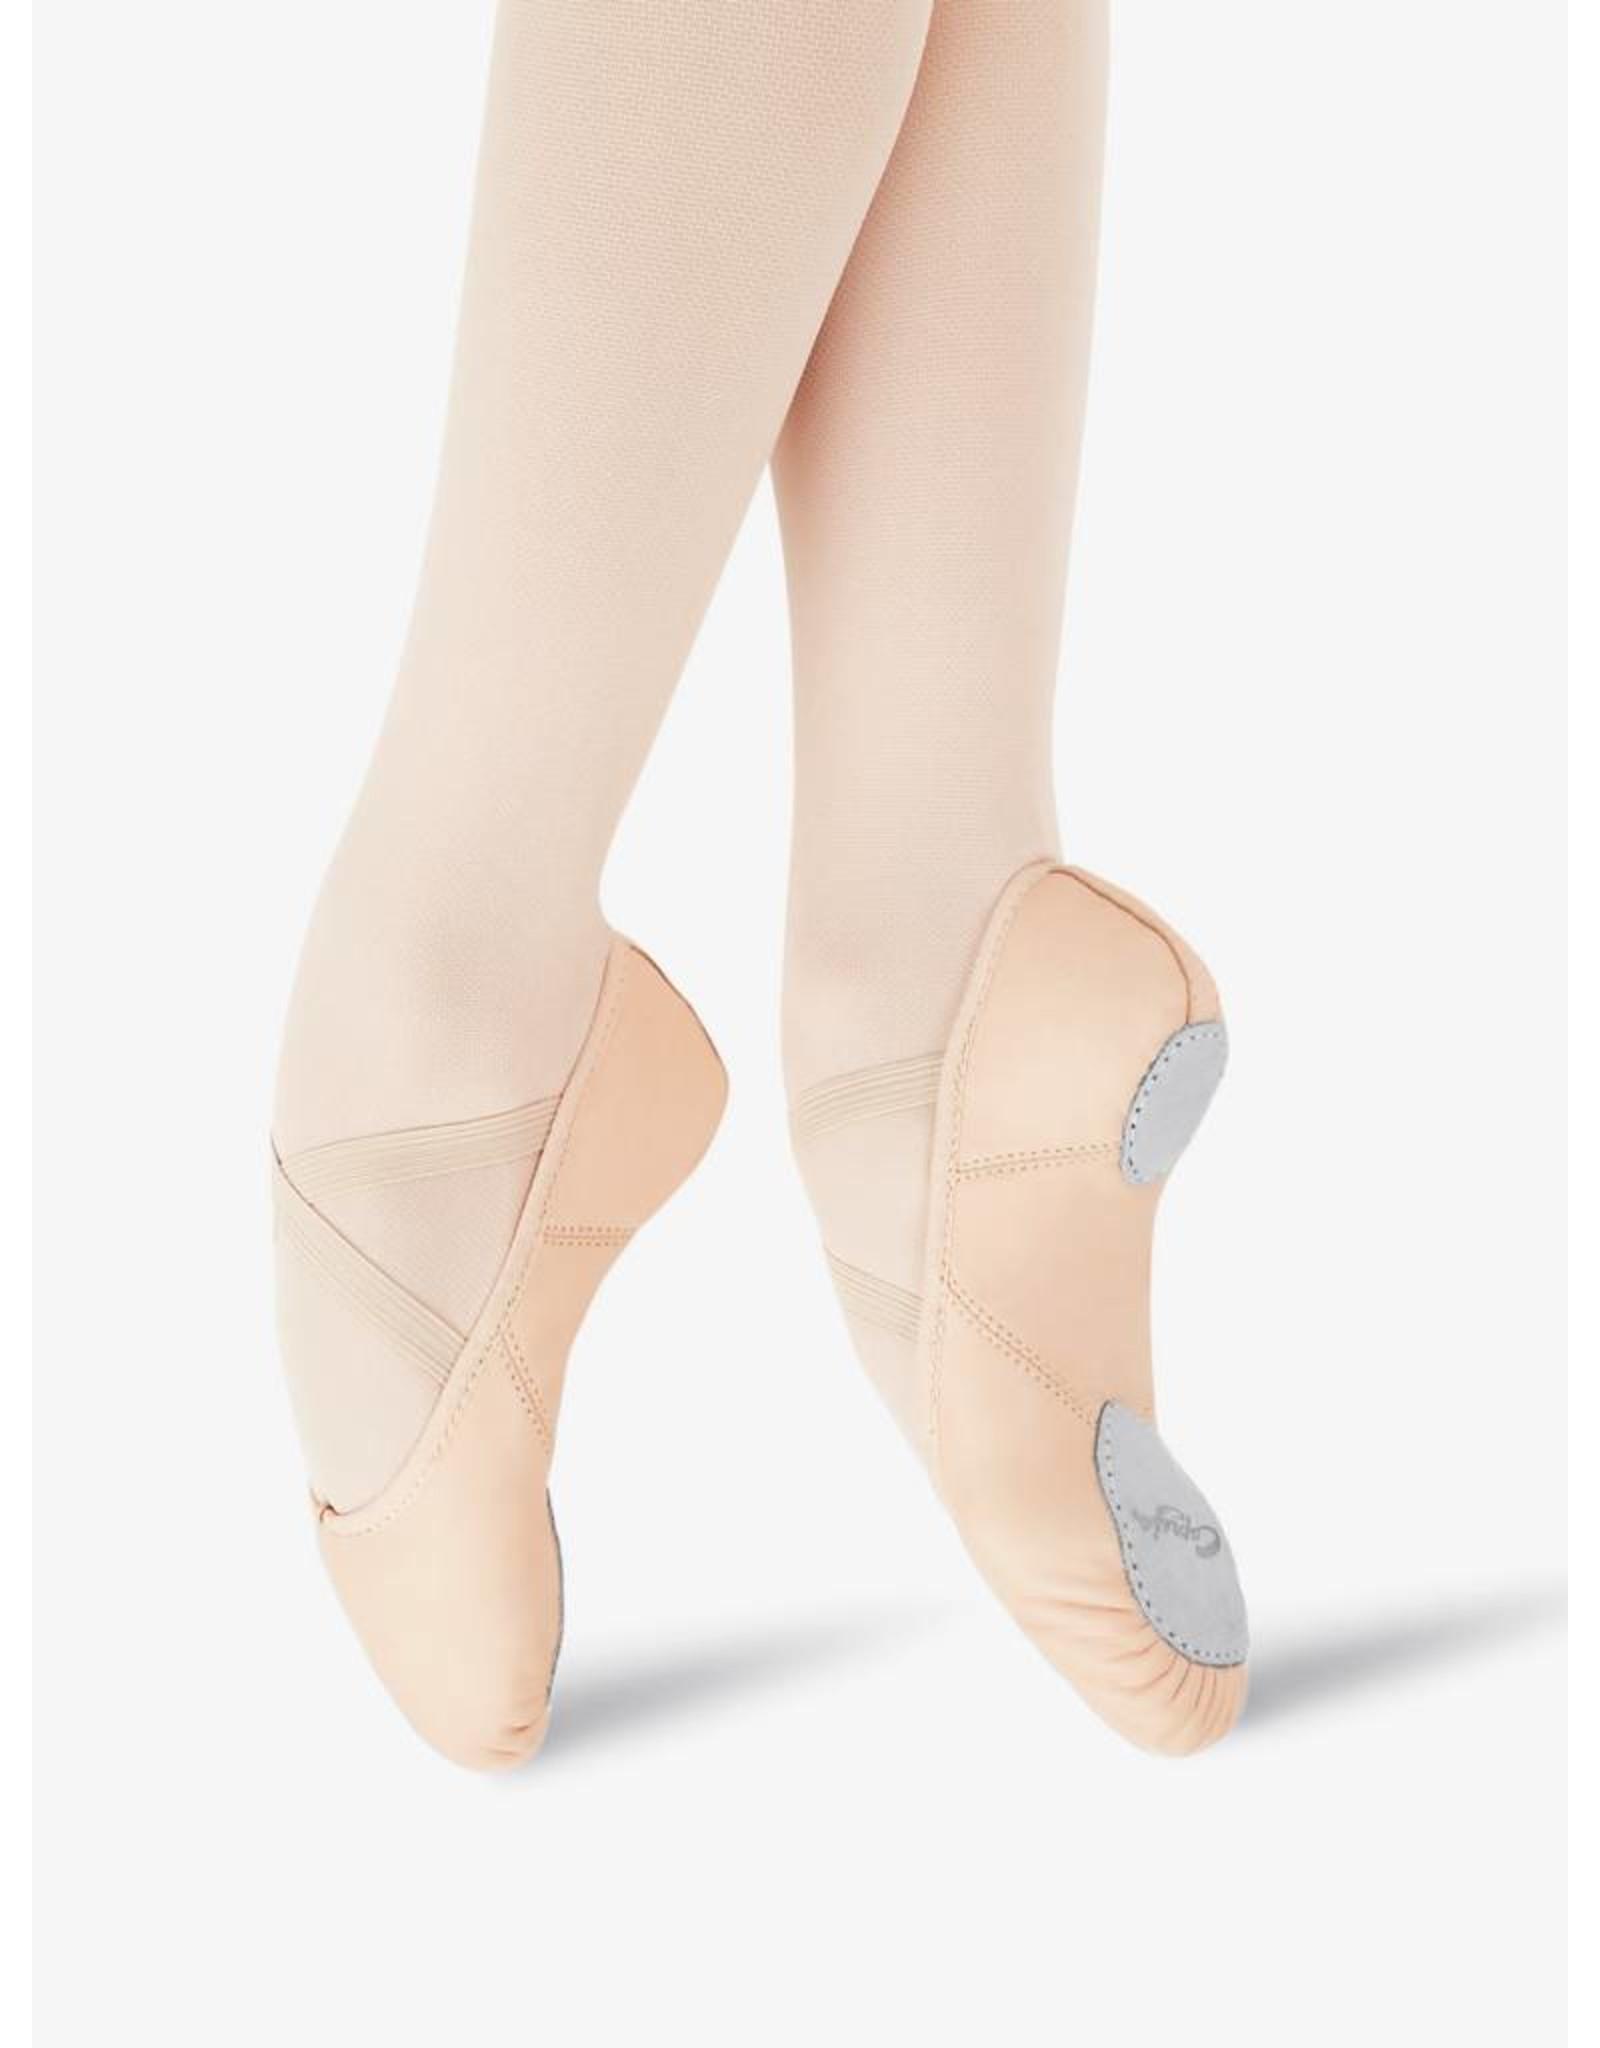 Sansha MODEL 3 Silhouette Split Sole Canvas Ballet Slipper  PINK